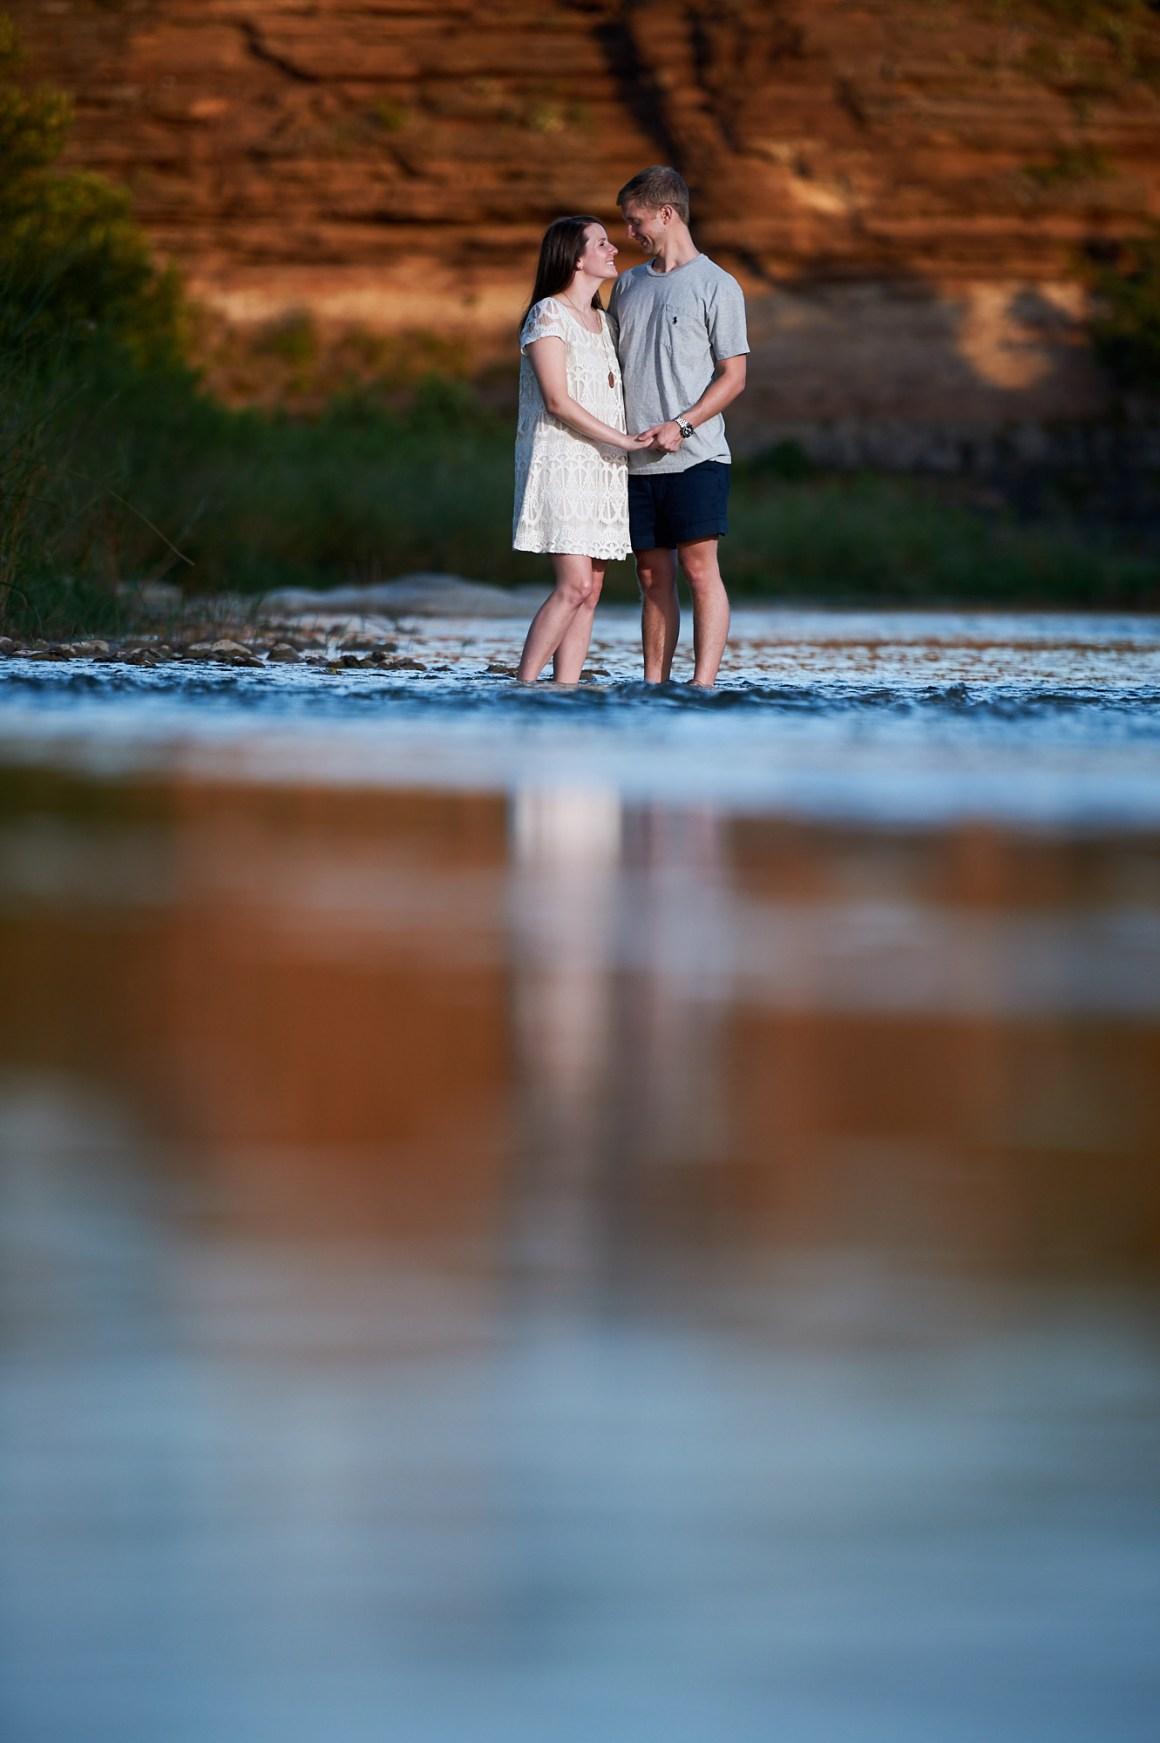 Chase and Lindsey Kayaking Engagement on Llano River